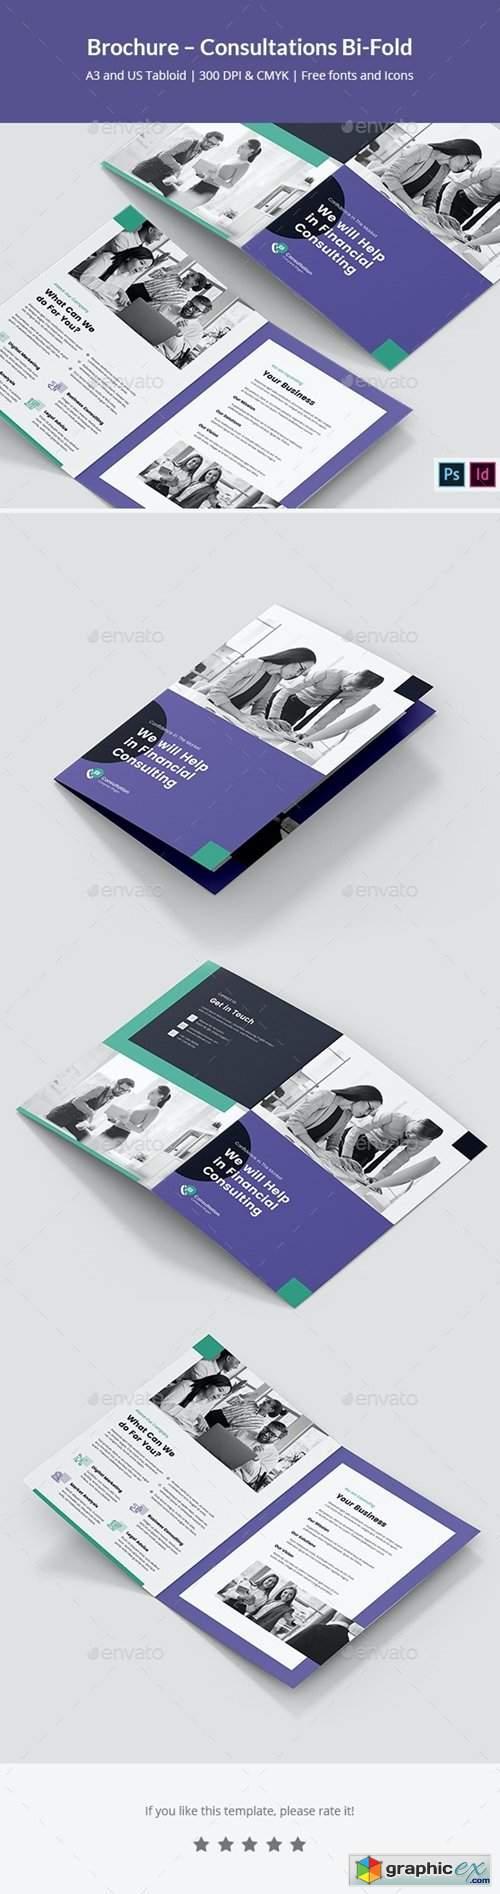 Brochure – Consultations Bi-Fold